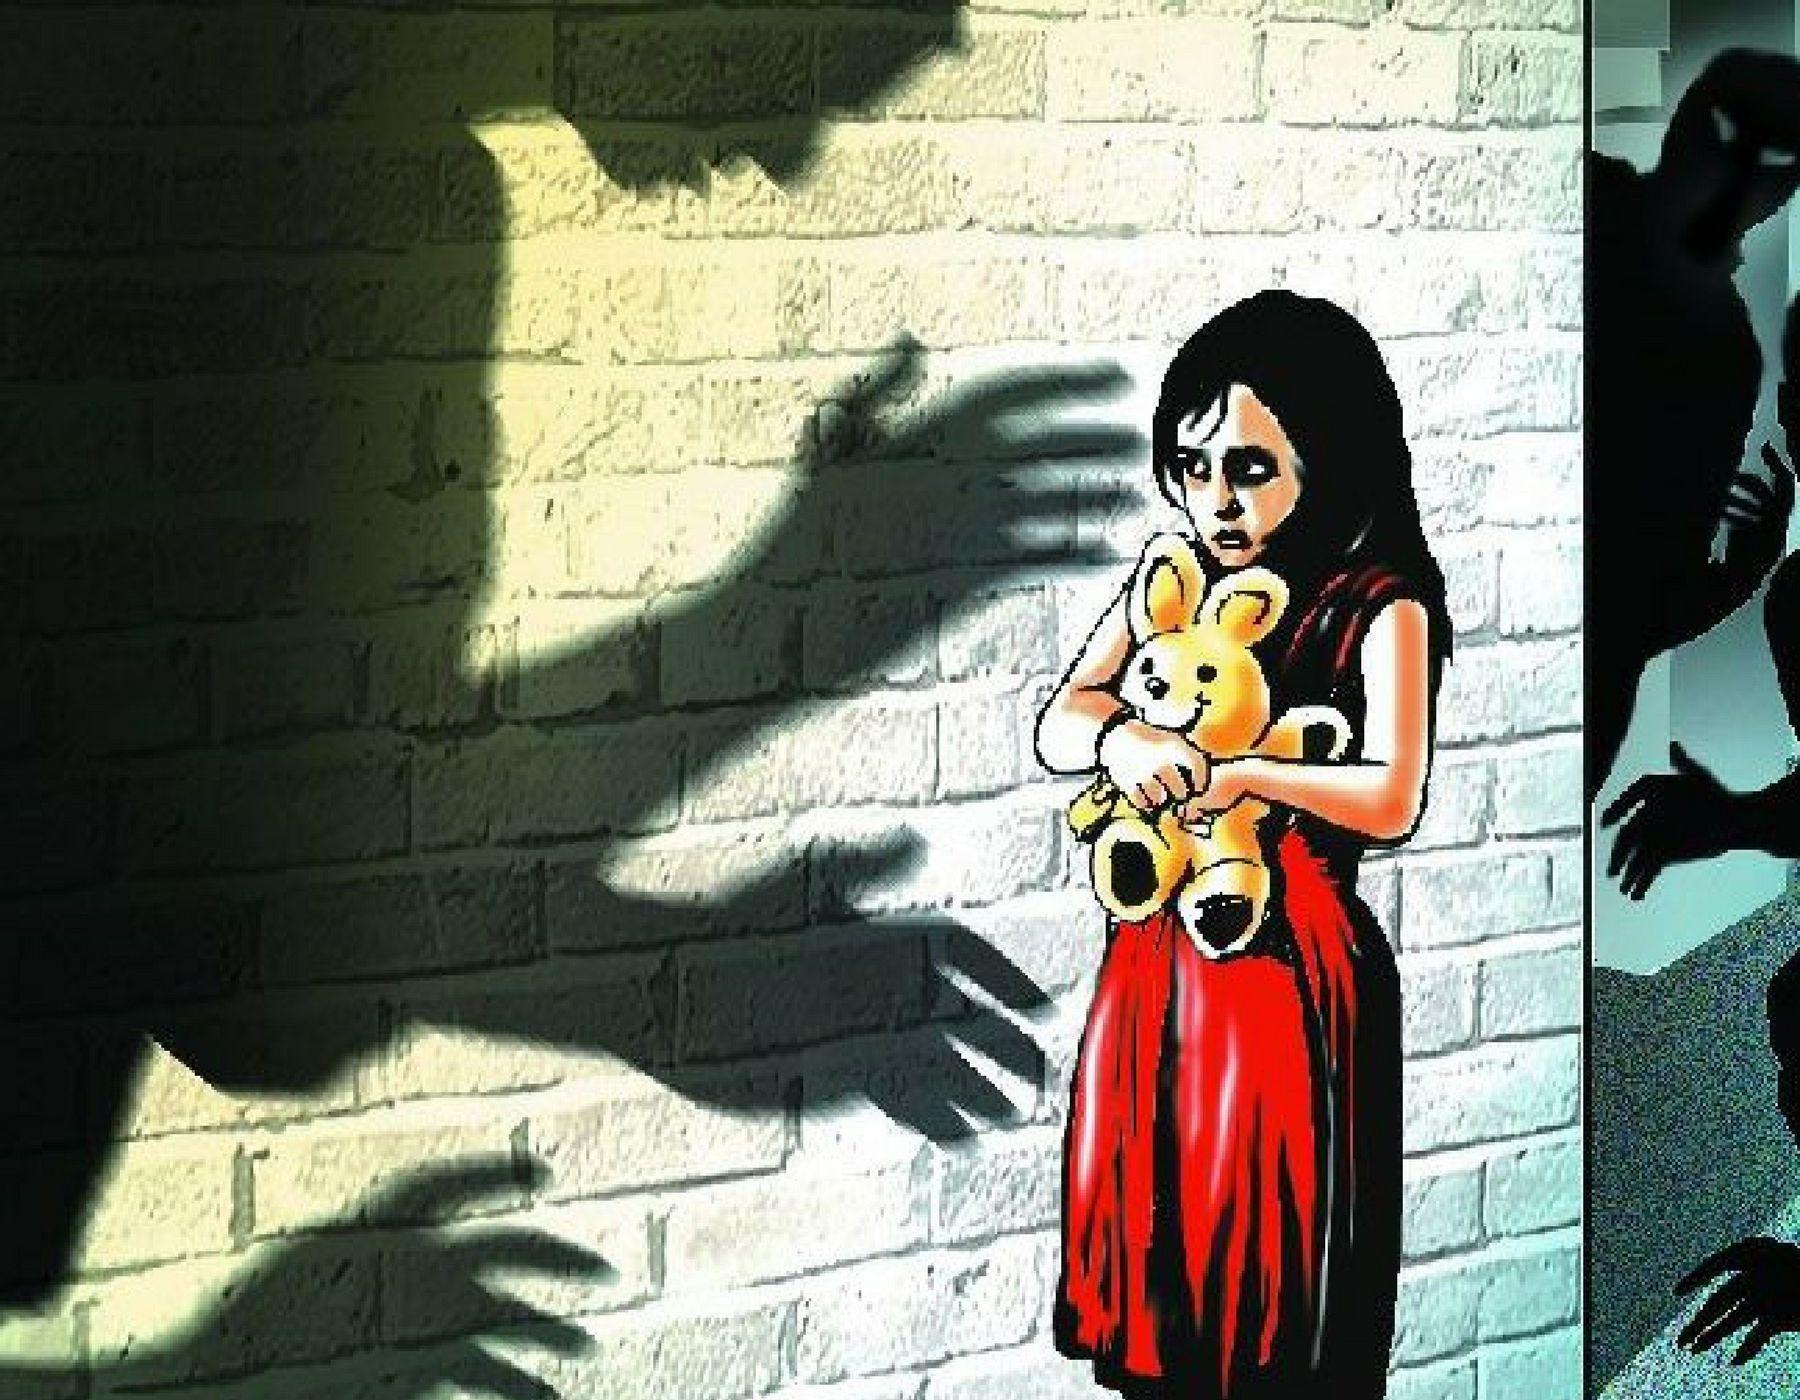 Madhya Pradesh Rape News